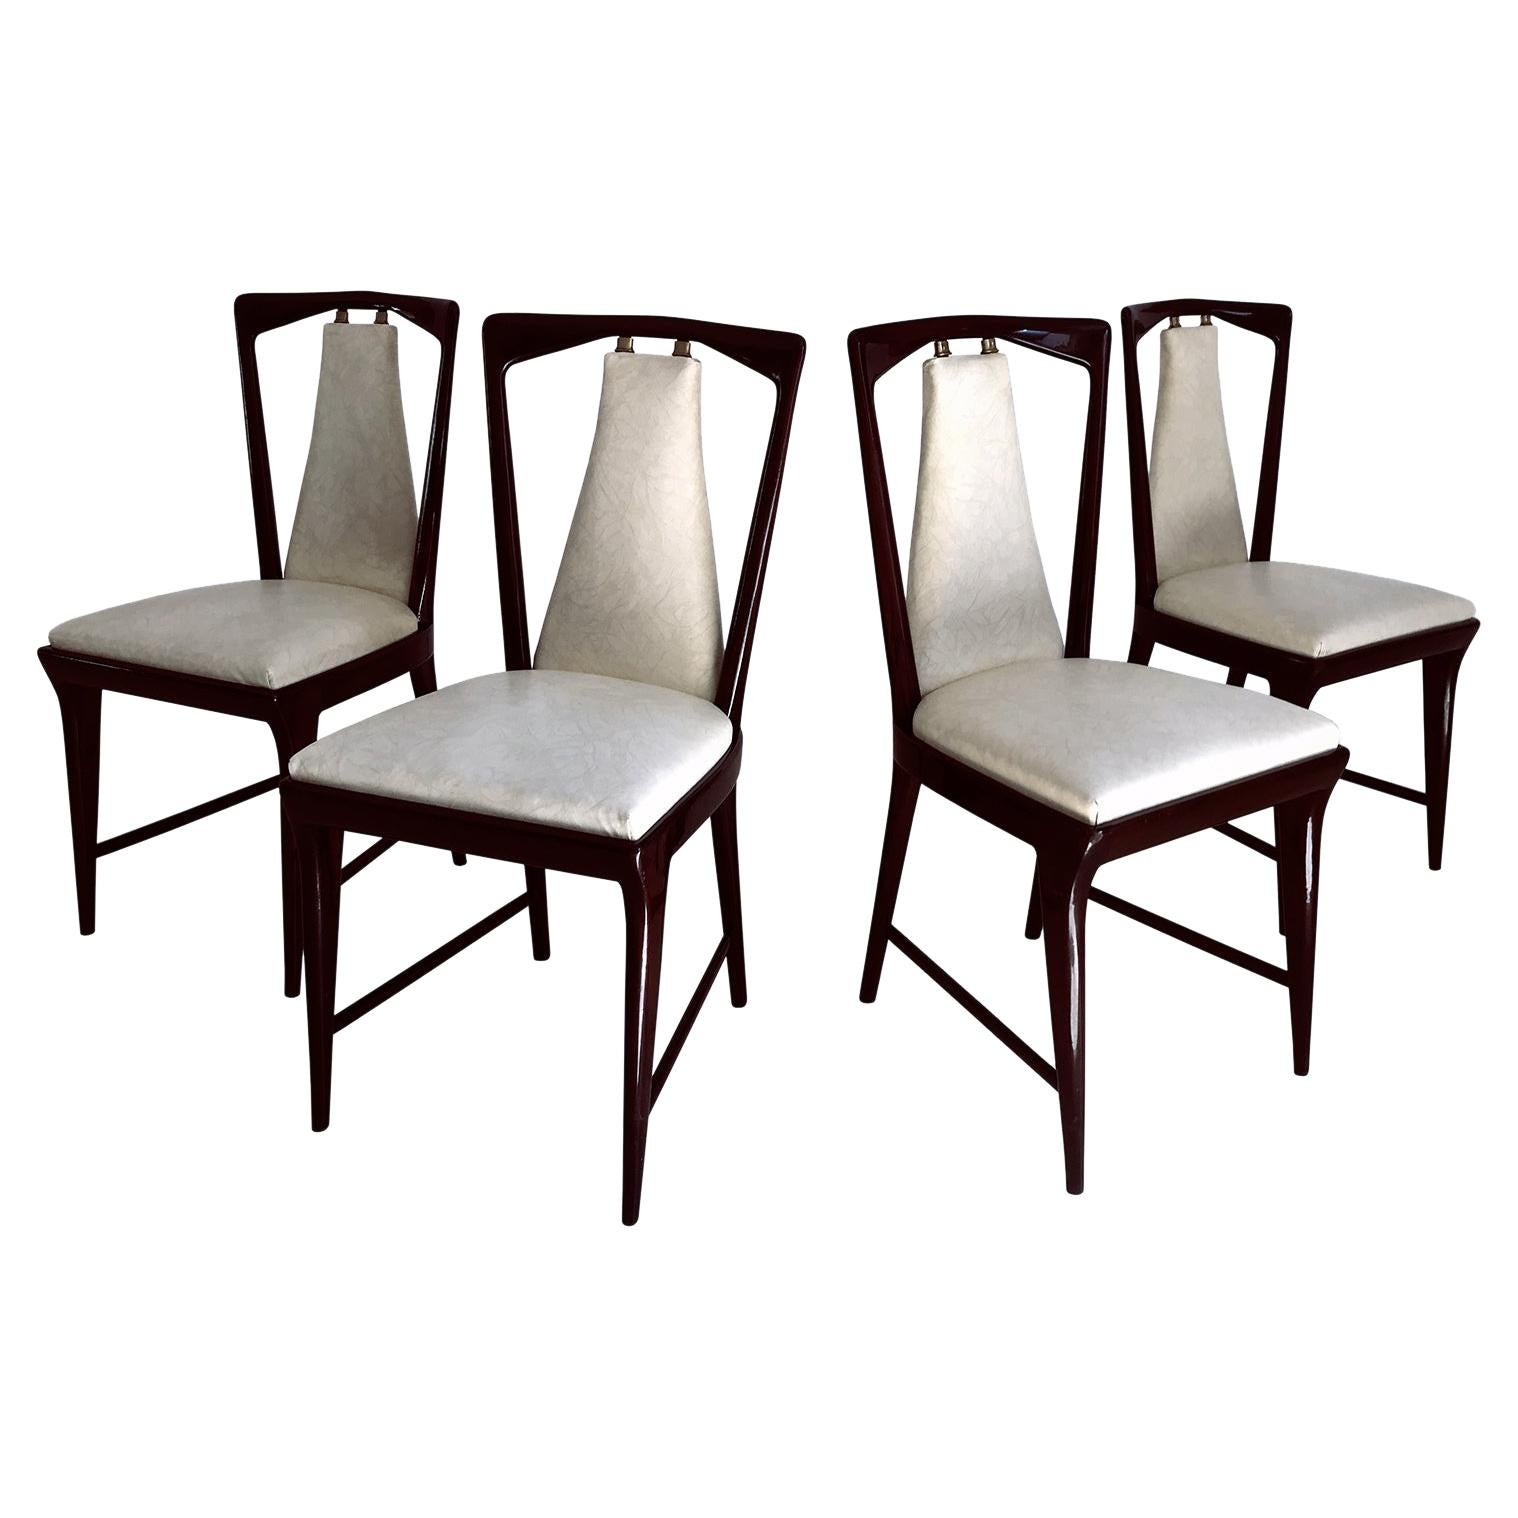 Italian Mid-Century Dining Chairs by Osvaldo Borsani, Set of Four, 1950s